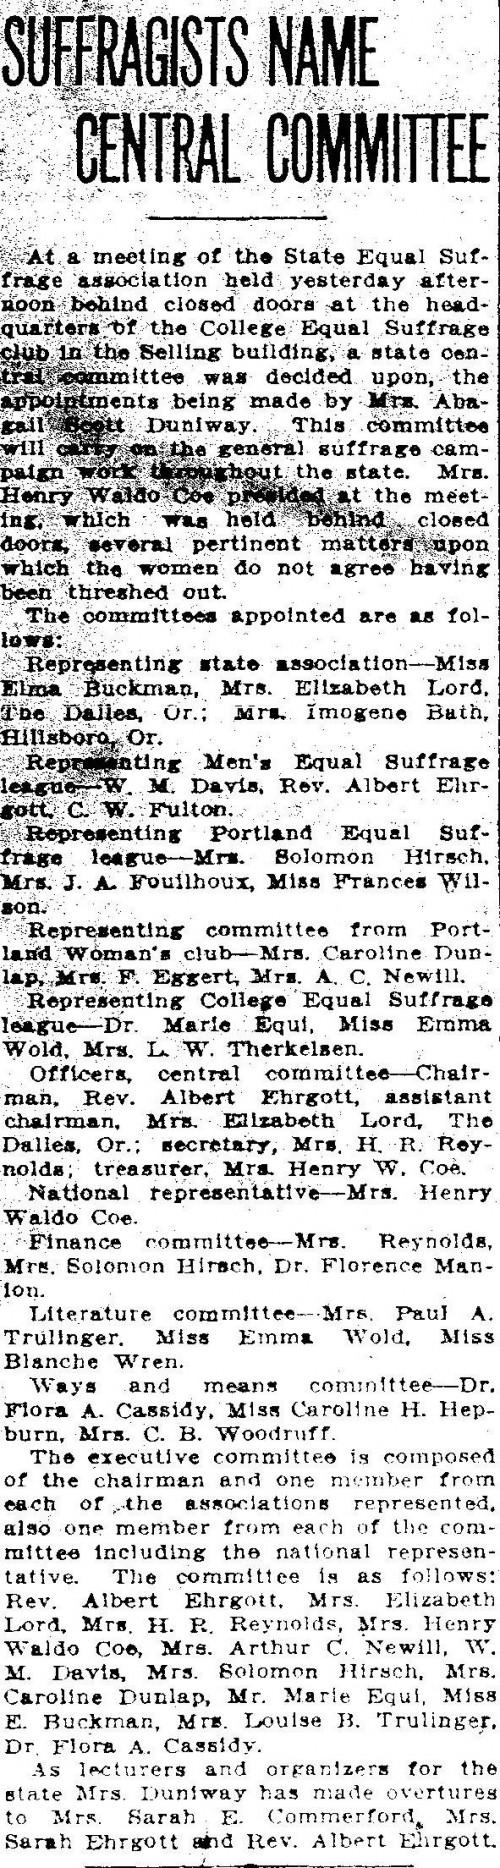 http://centuryofaction.org/images/uploads/OJ_3_9_1912_2_Suffragists_Name_thumb.jpg